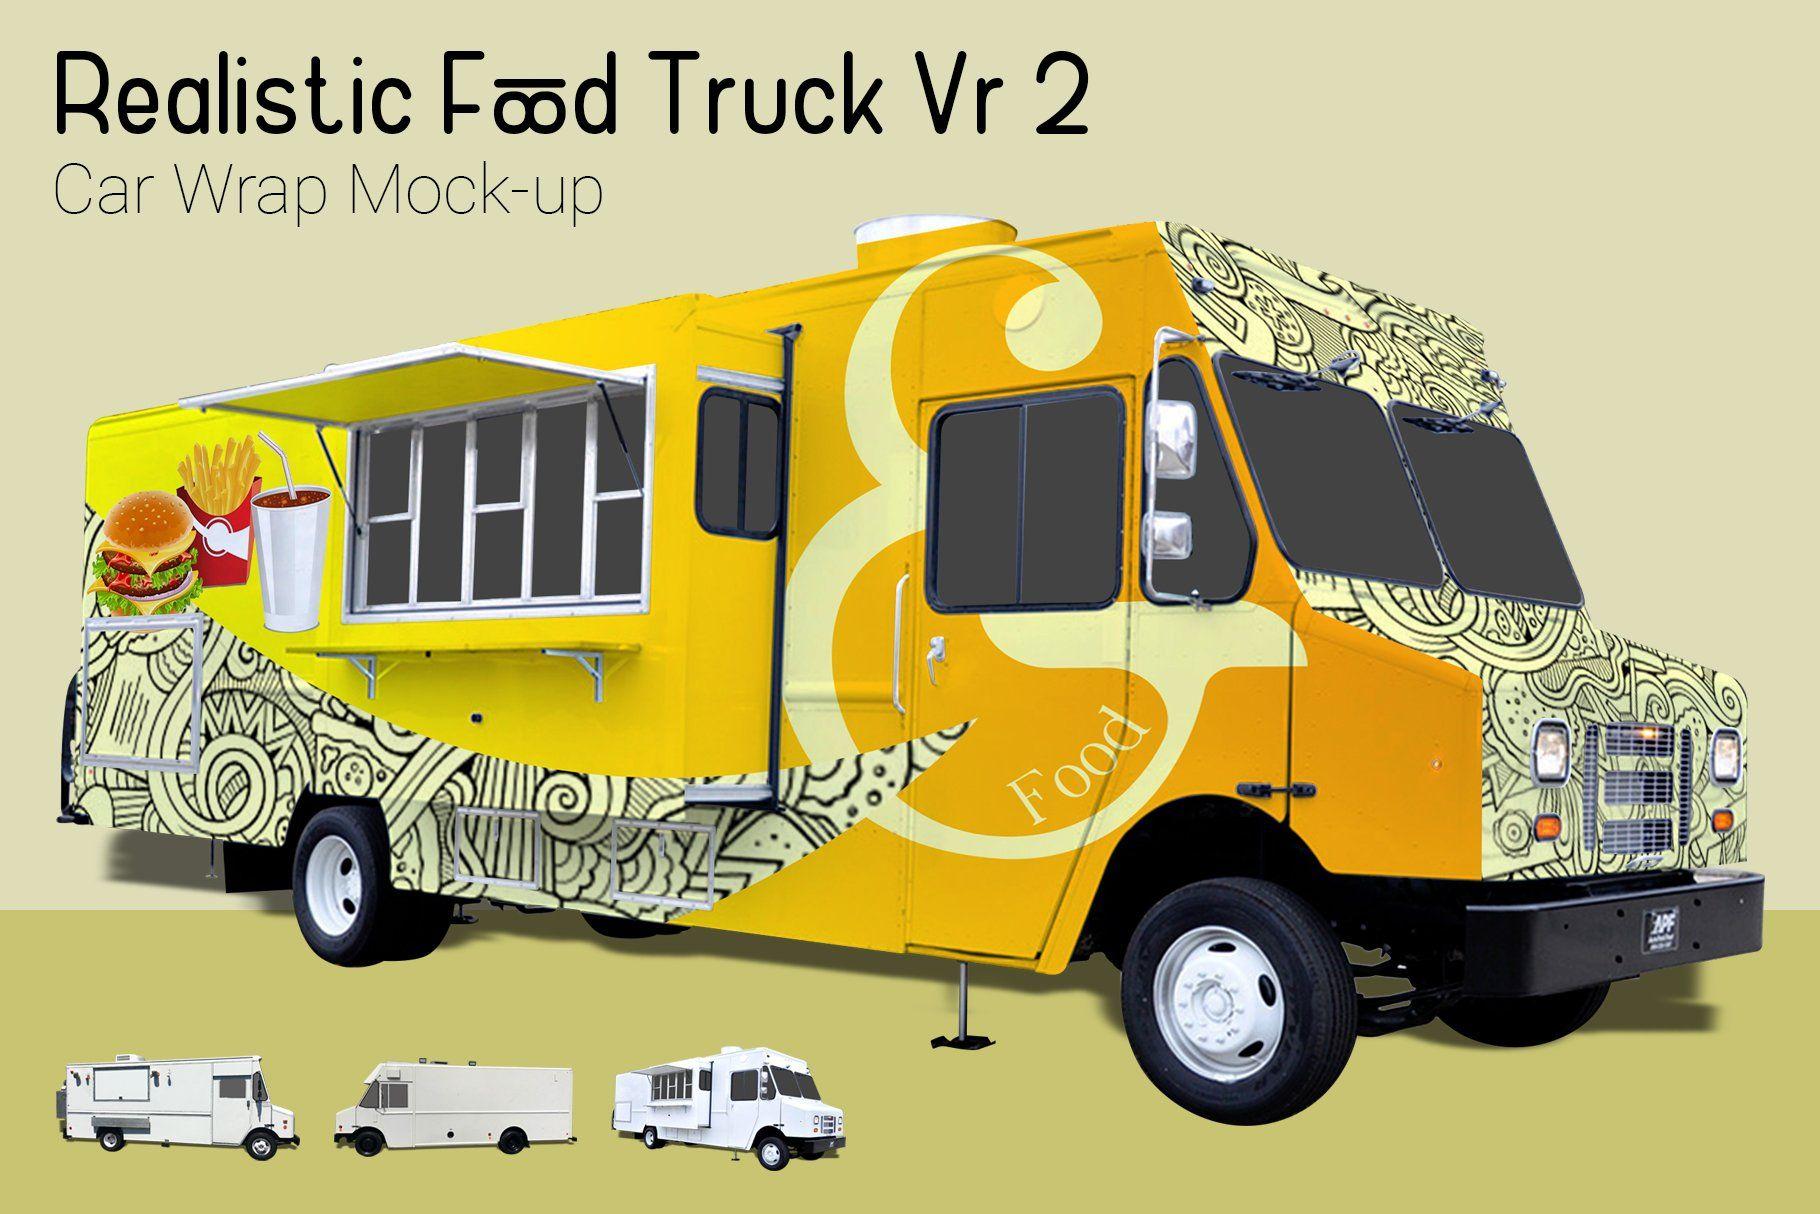 Food truck mockup vr2